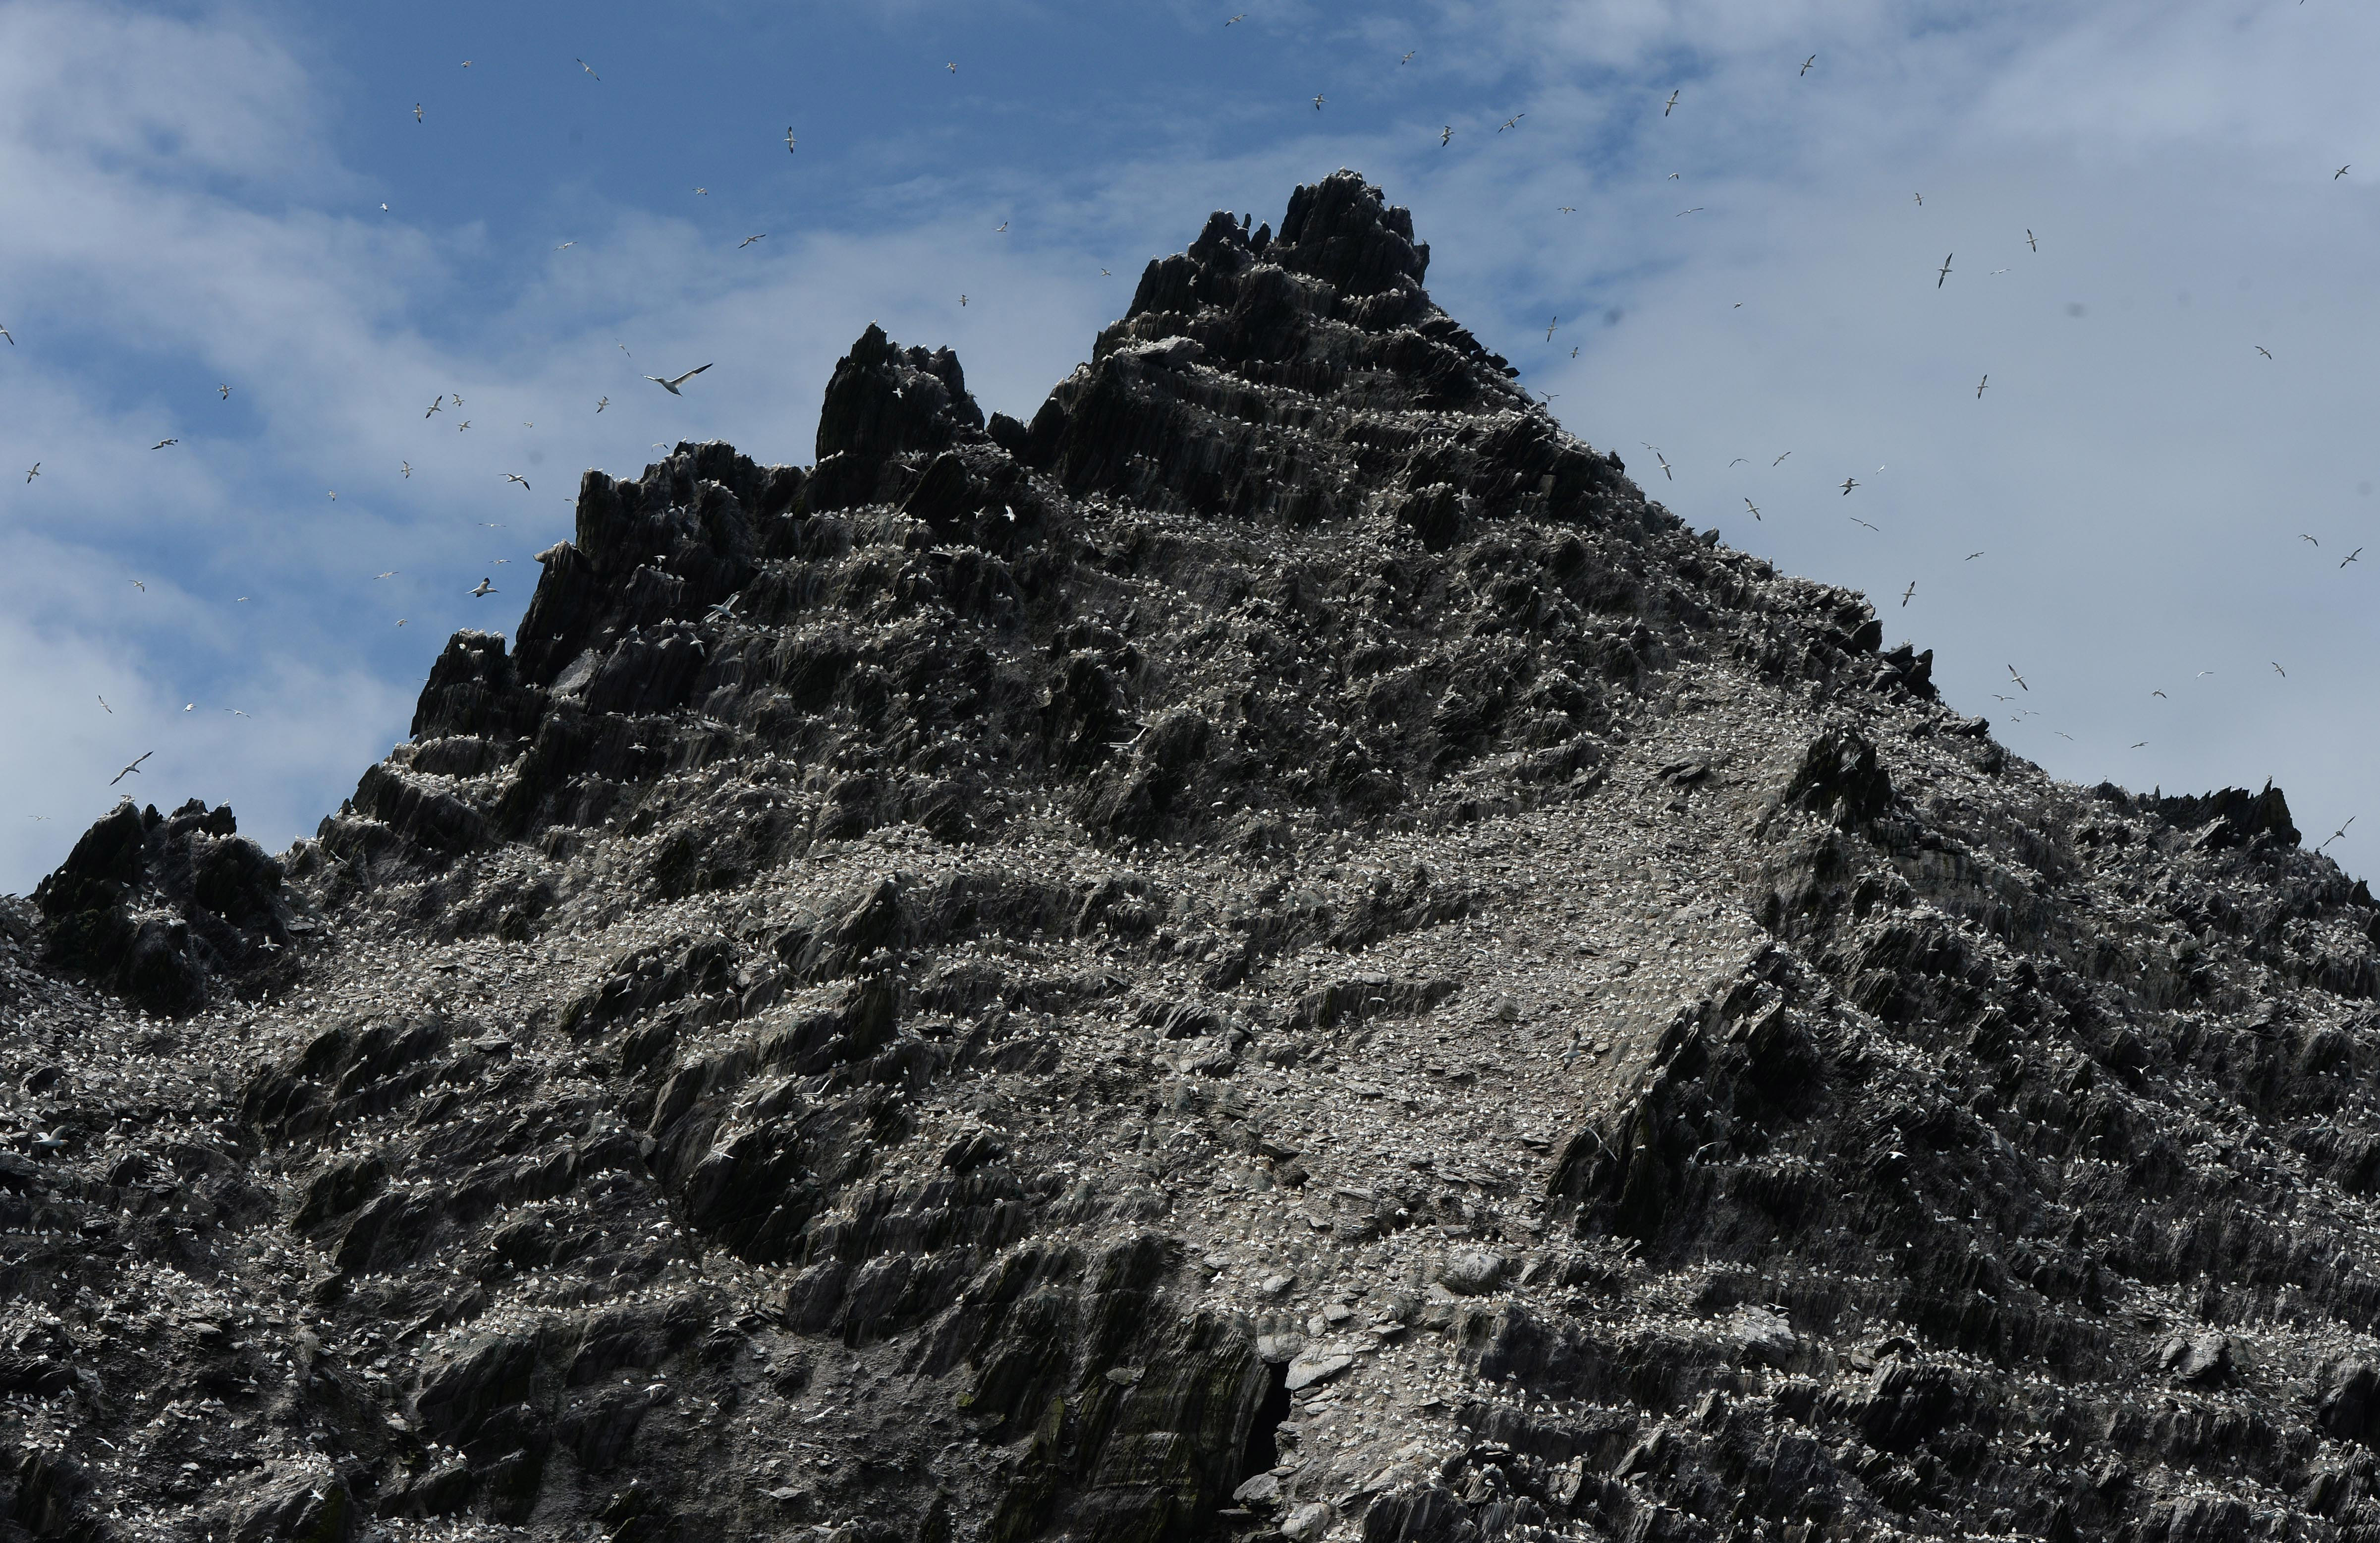 Birds on Skellig Michael island as Star Wars Episode VII directed by JJ Abrams begins filming, July 28, 2014 in Skellig island, Ireland.